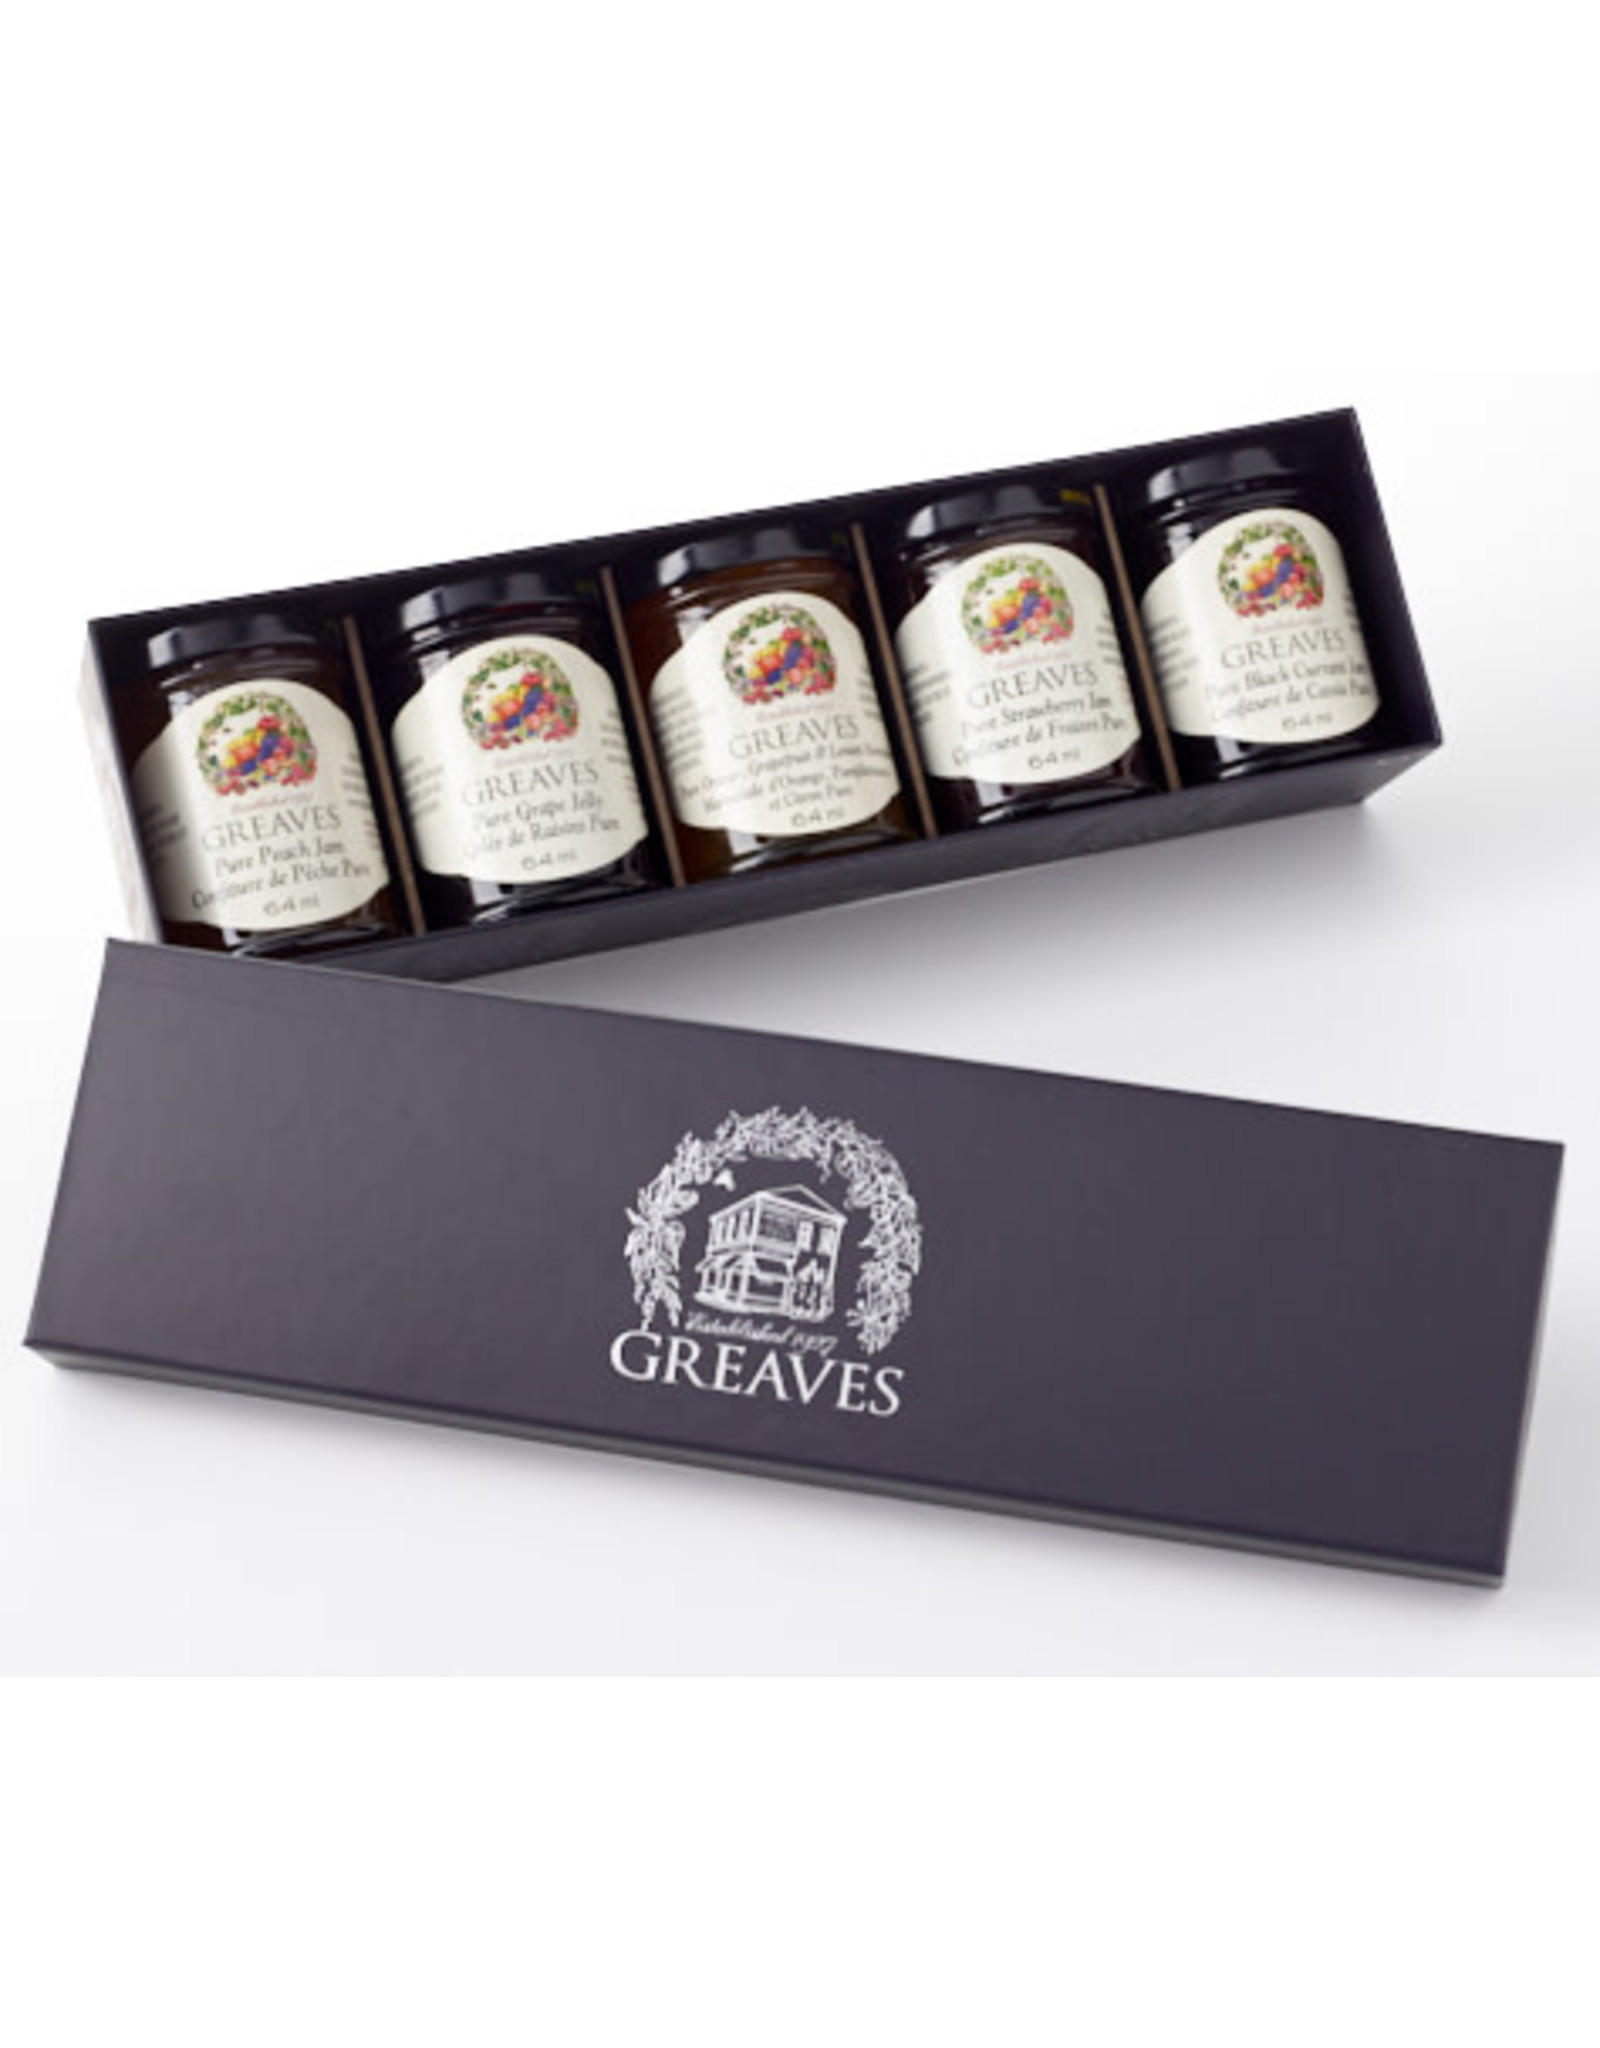 Greaves Jams & Marmalades Ltd. Greaves, Royal Purple Gift Box, 5 x 64ml